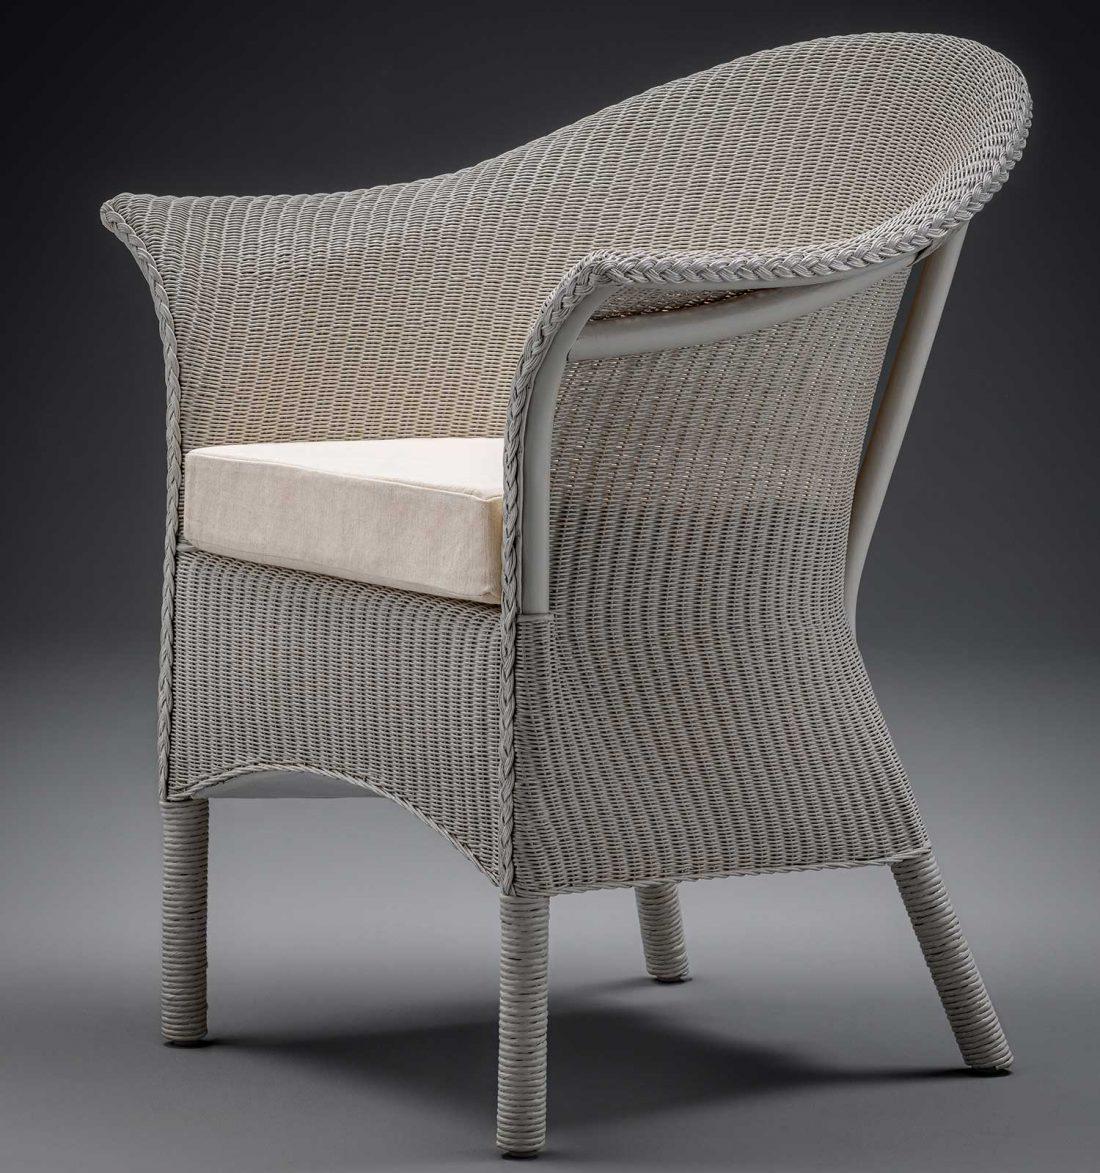 Lloyd Loom Montpellier Chairs